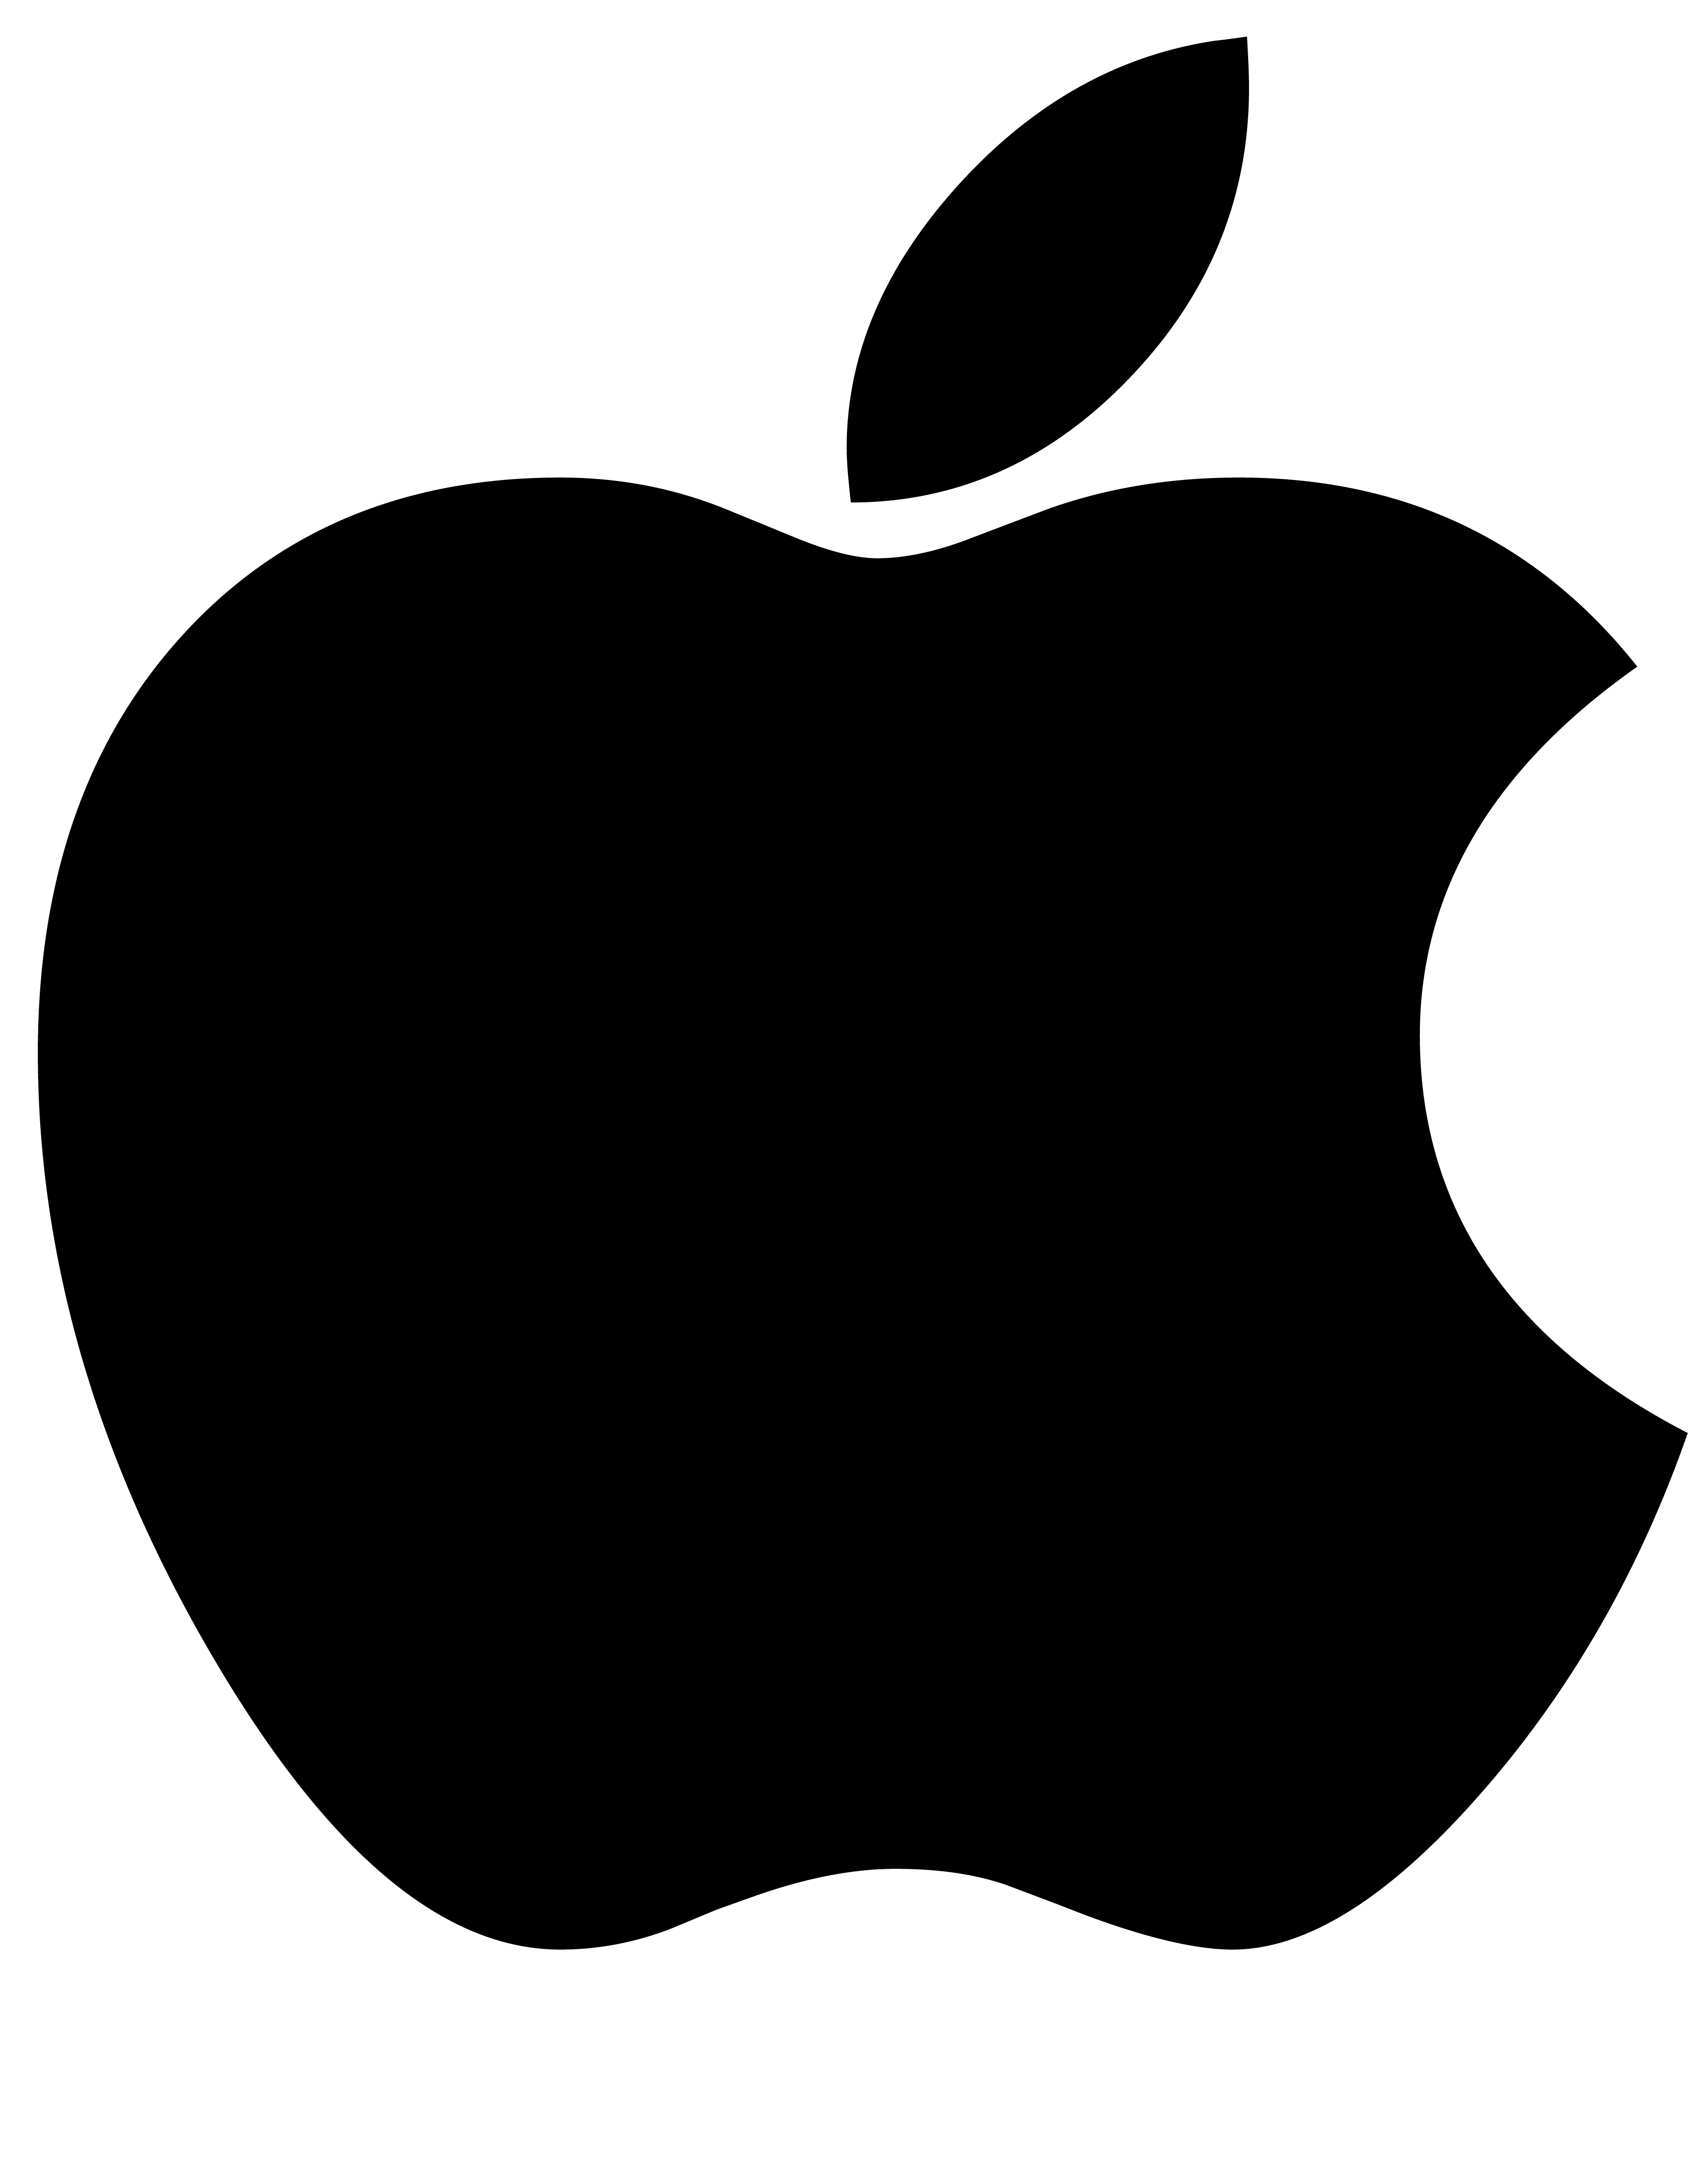 Clipart phone iphone apple. Logo http gadgets saqibsomal